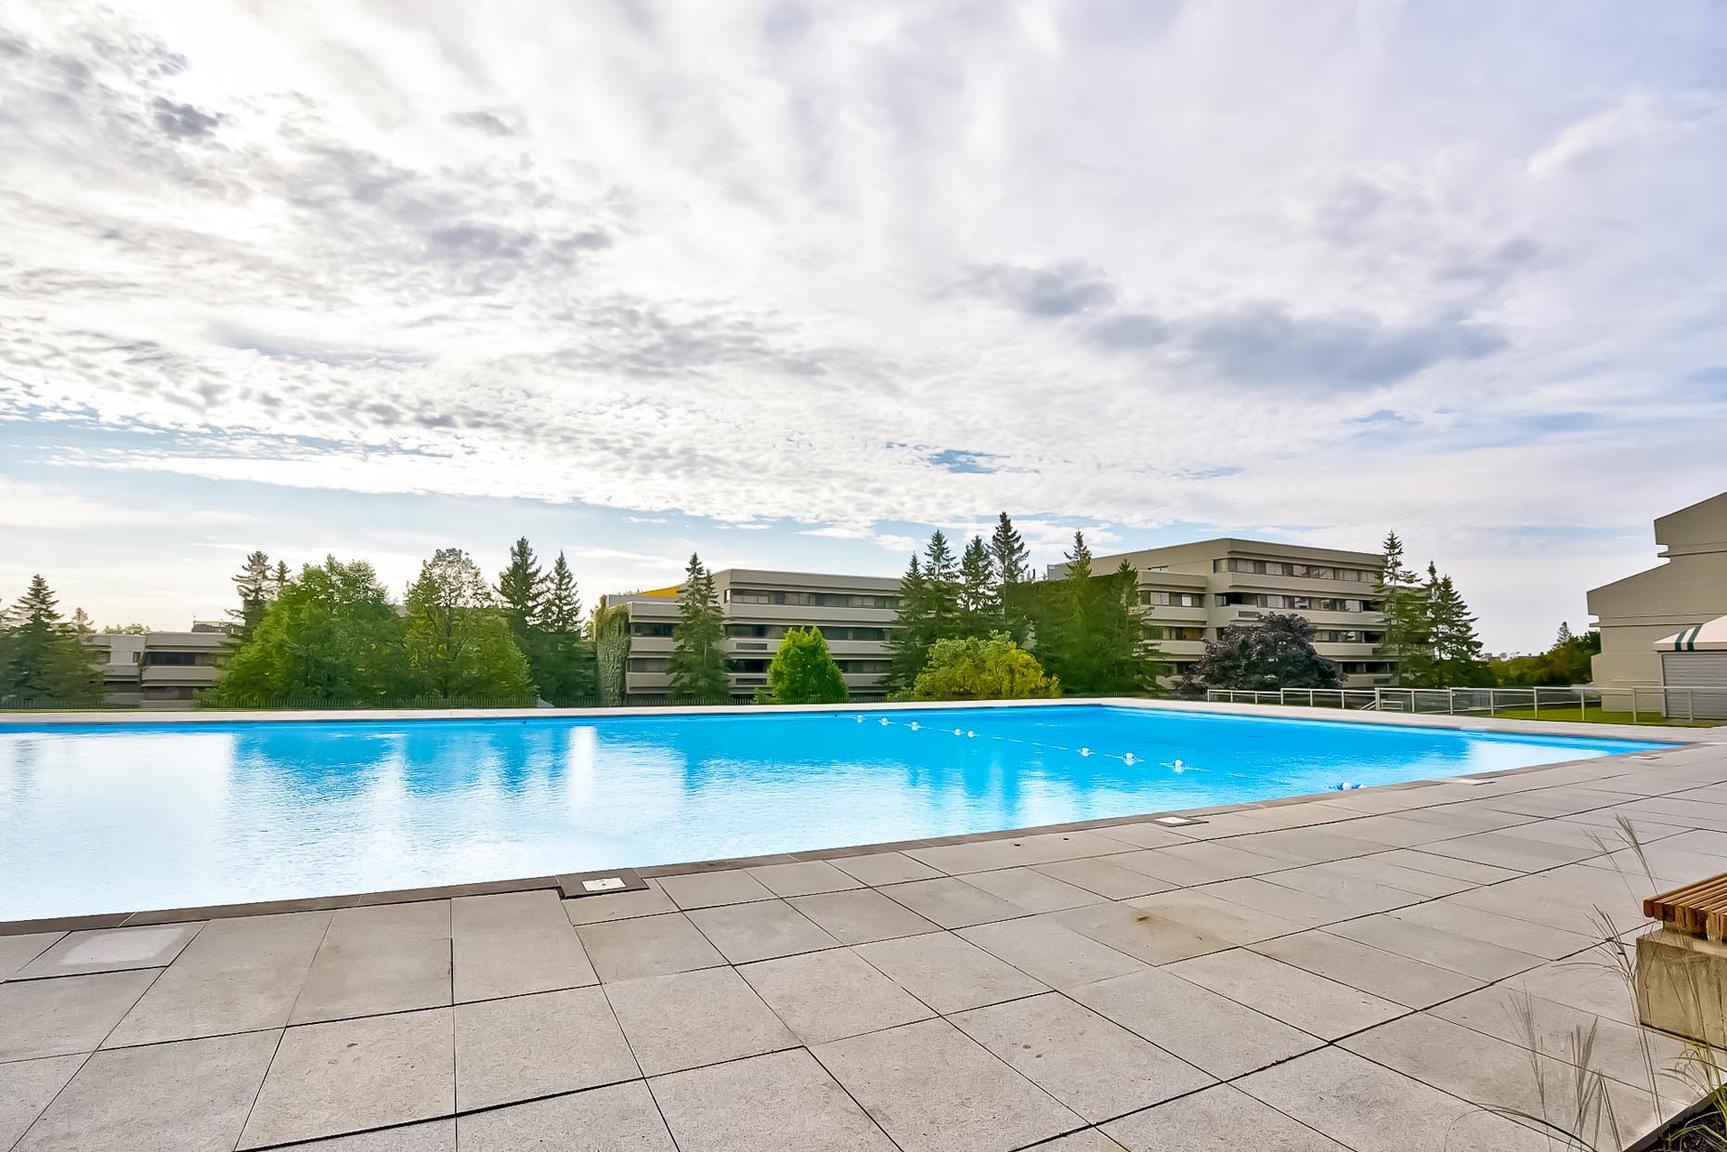 2 bedroom Apartments for rent in Quebec City at Les Jardins de Merici - Photo 37 - RentersPages – L407783